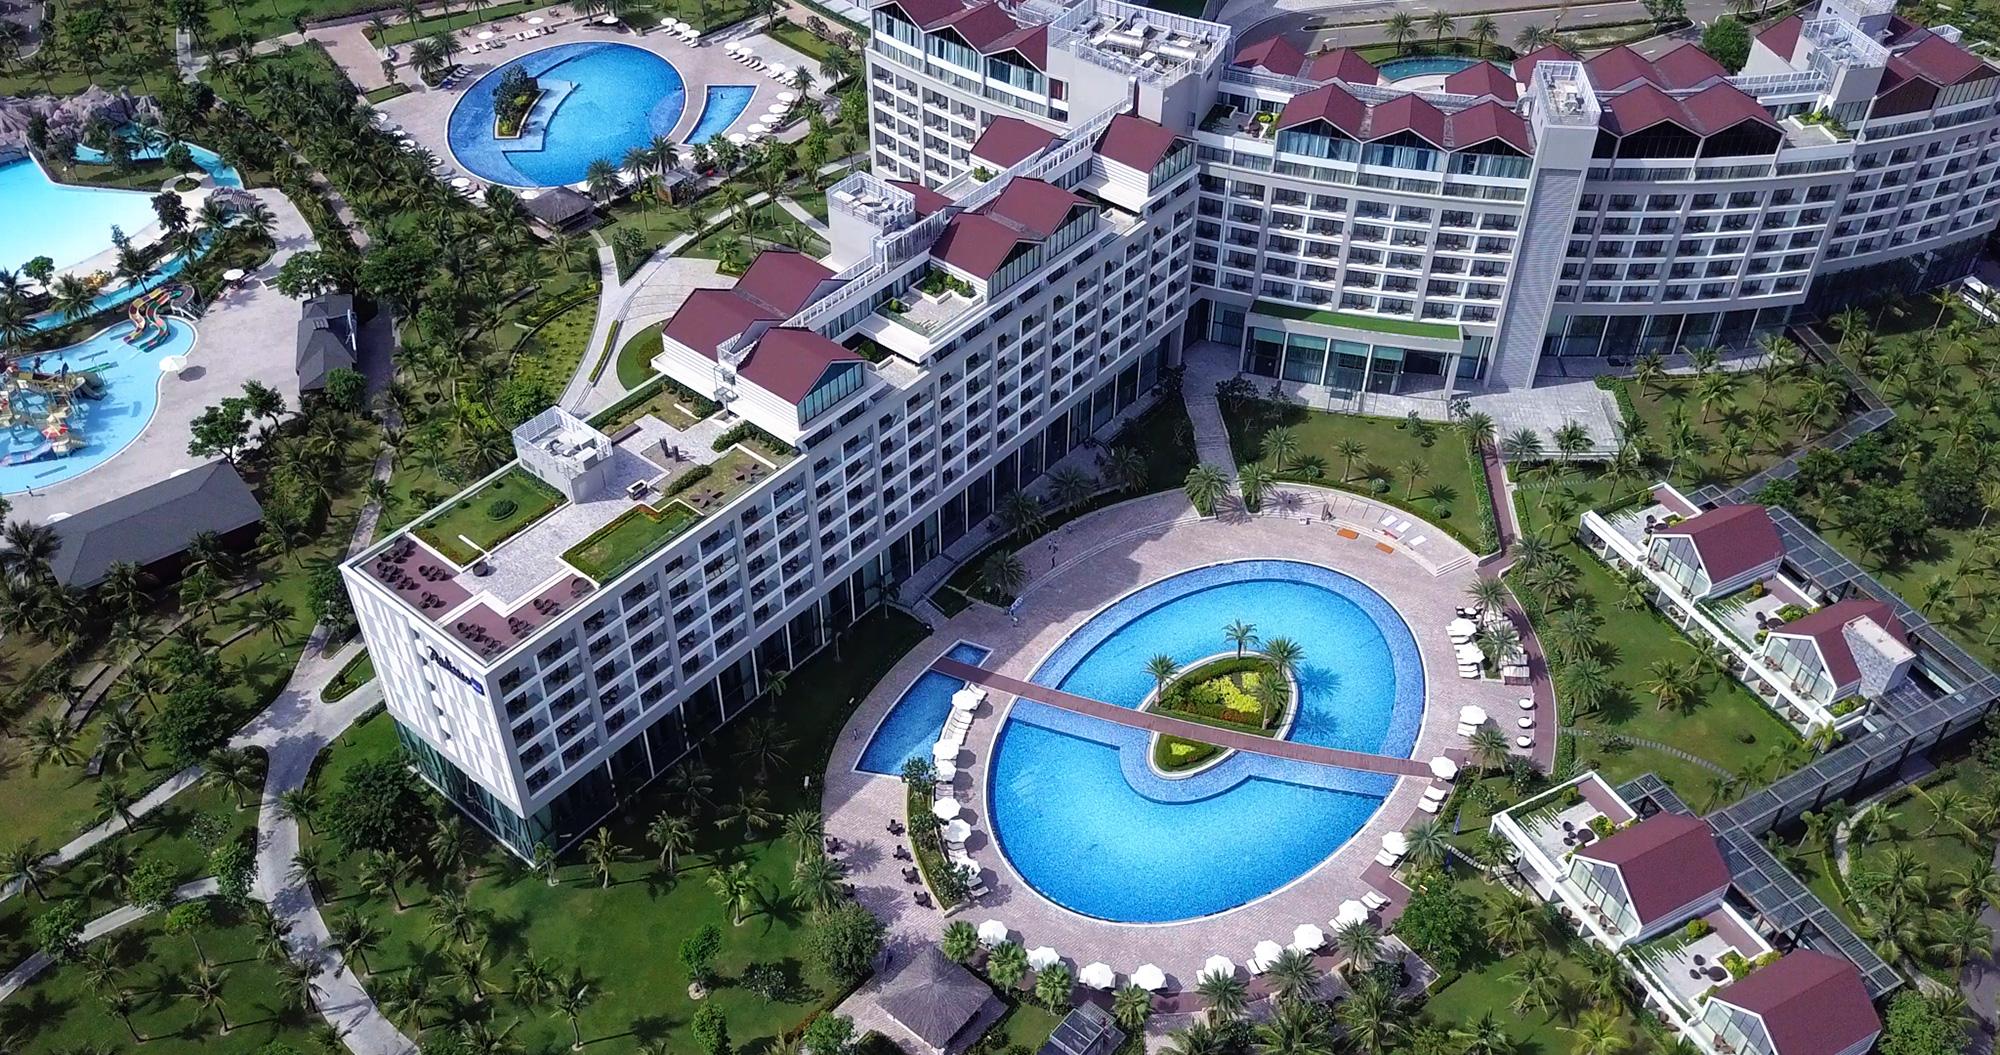 Cẩm nang du lịch Phú Quốc - Radisson Blu Resort Phu Quoc